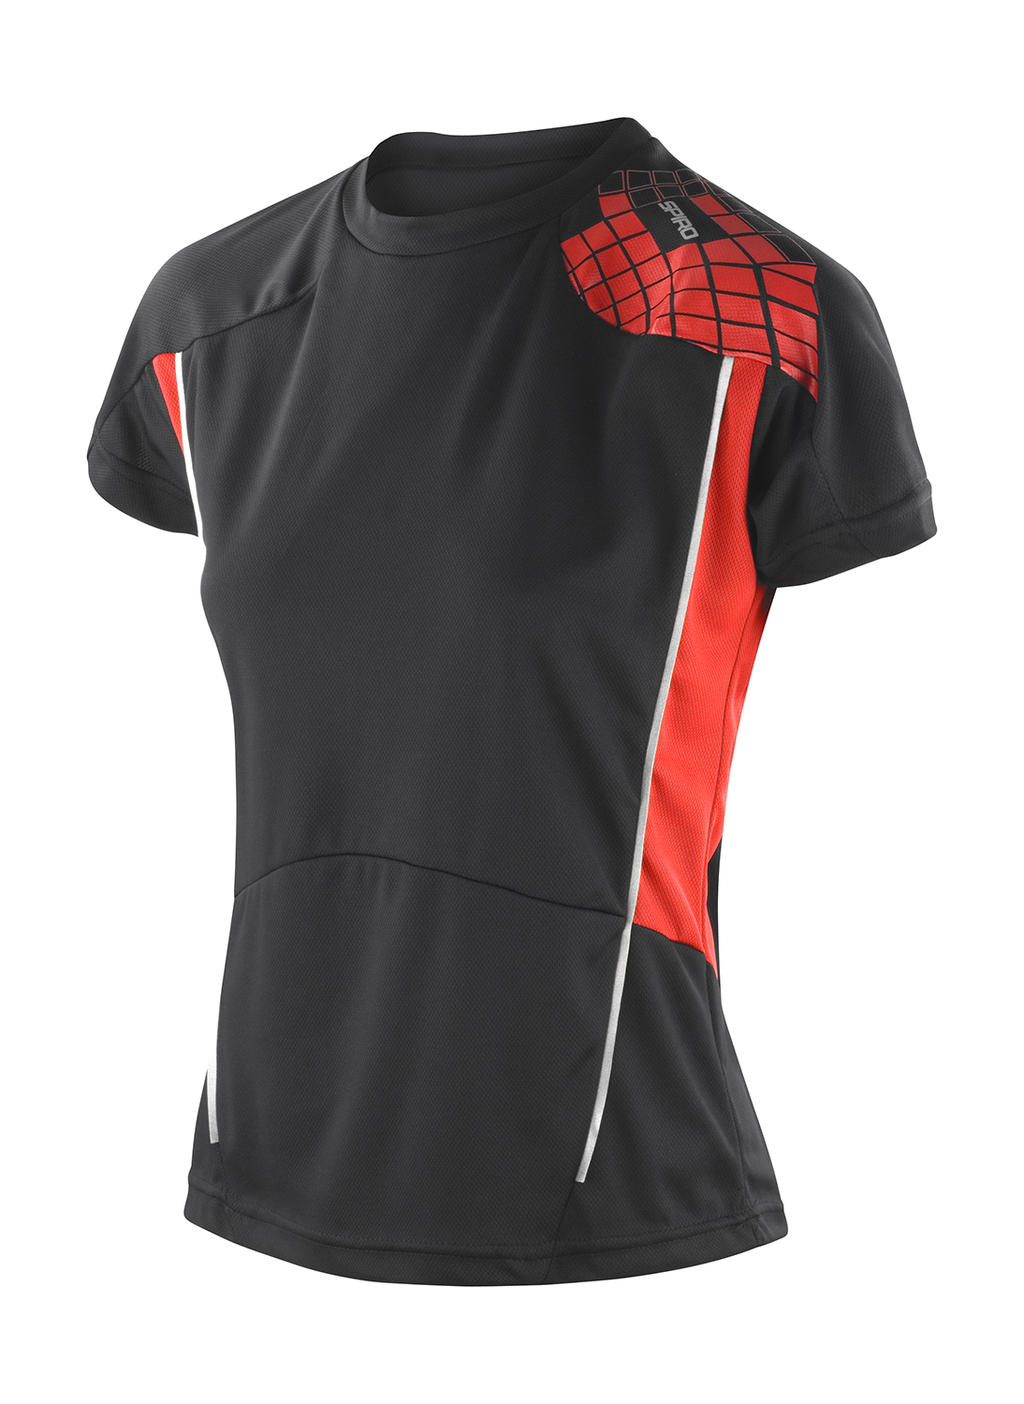 Women's Training Shirt